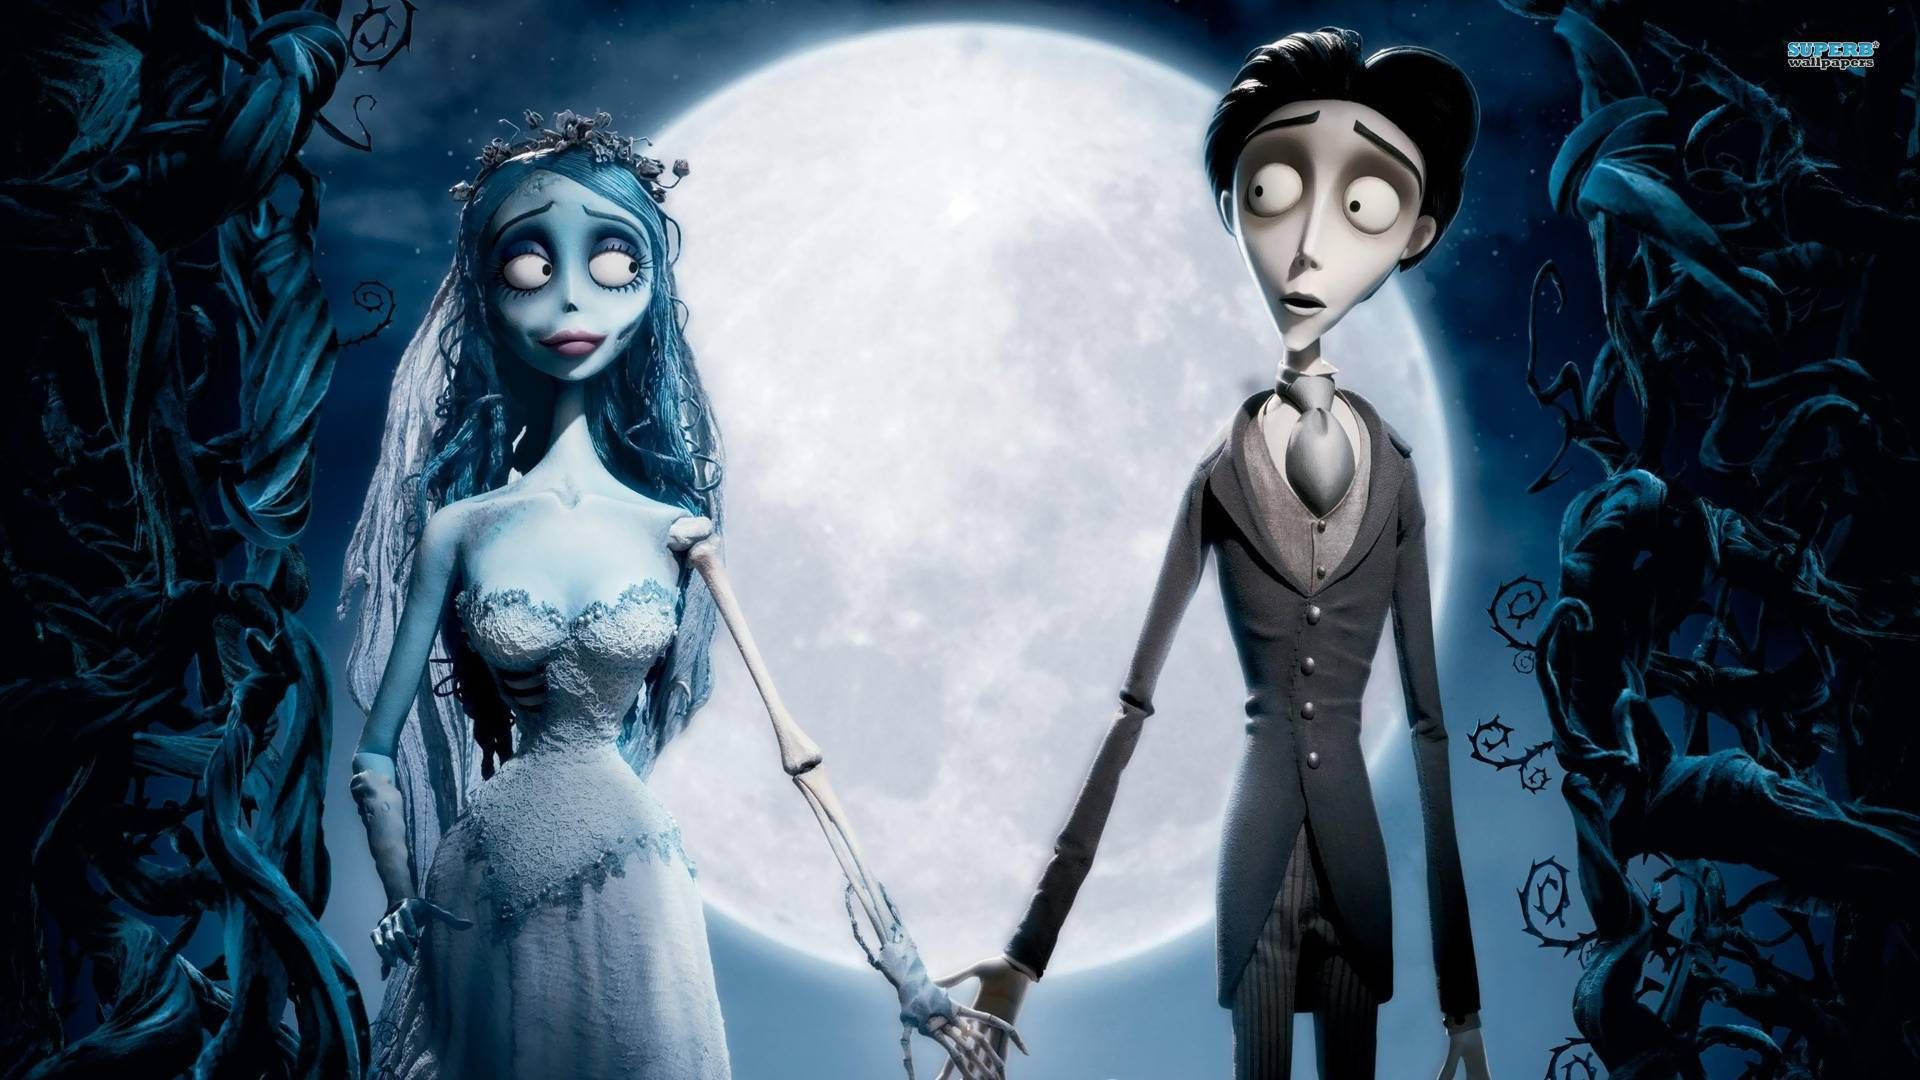 tim burton corpse bride Google Search Труп невесты